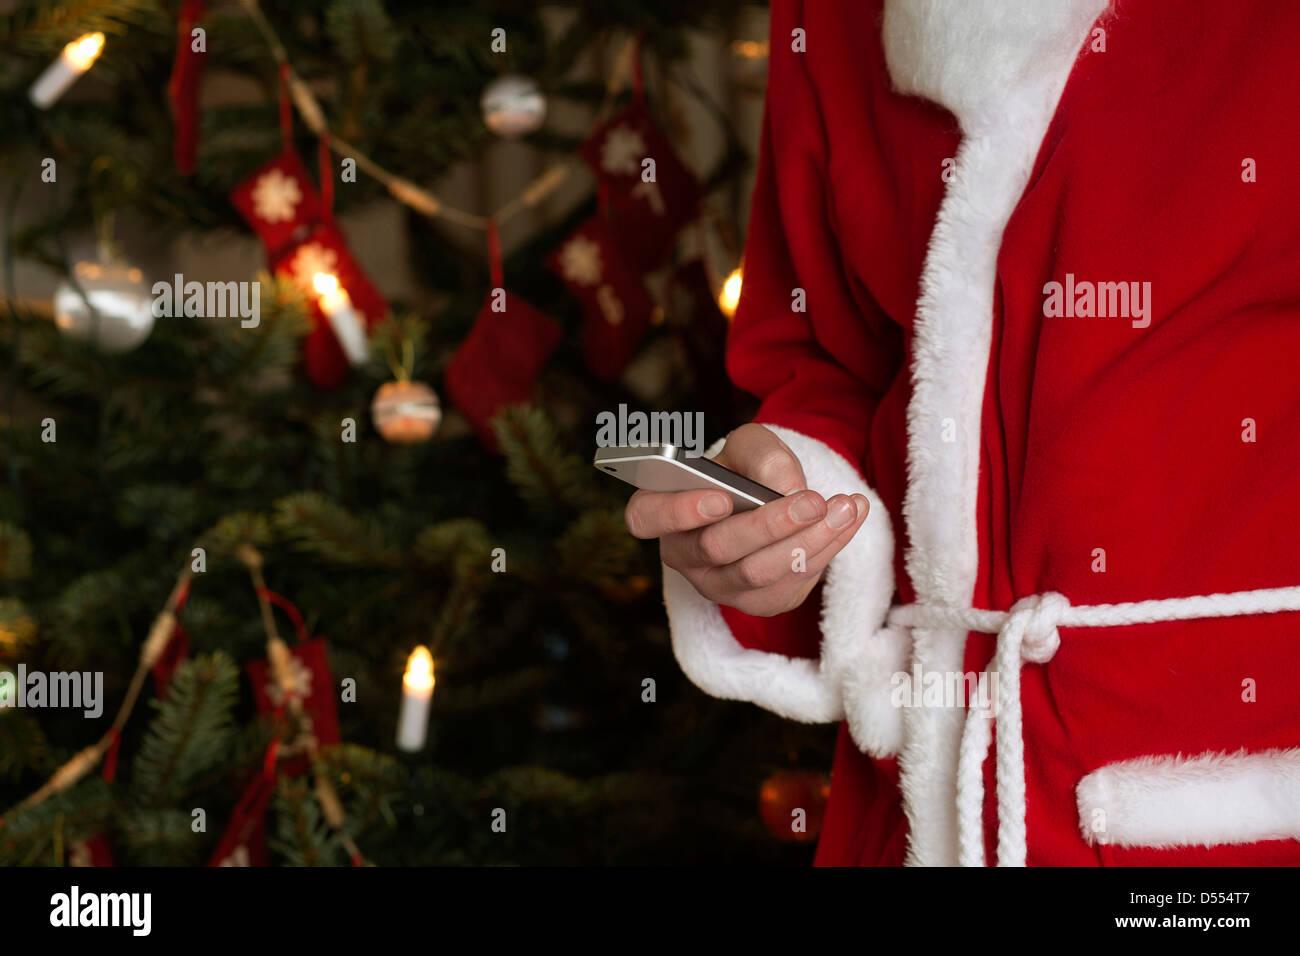 Santa Claus using cell phone - Stock Image